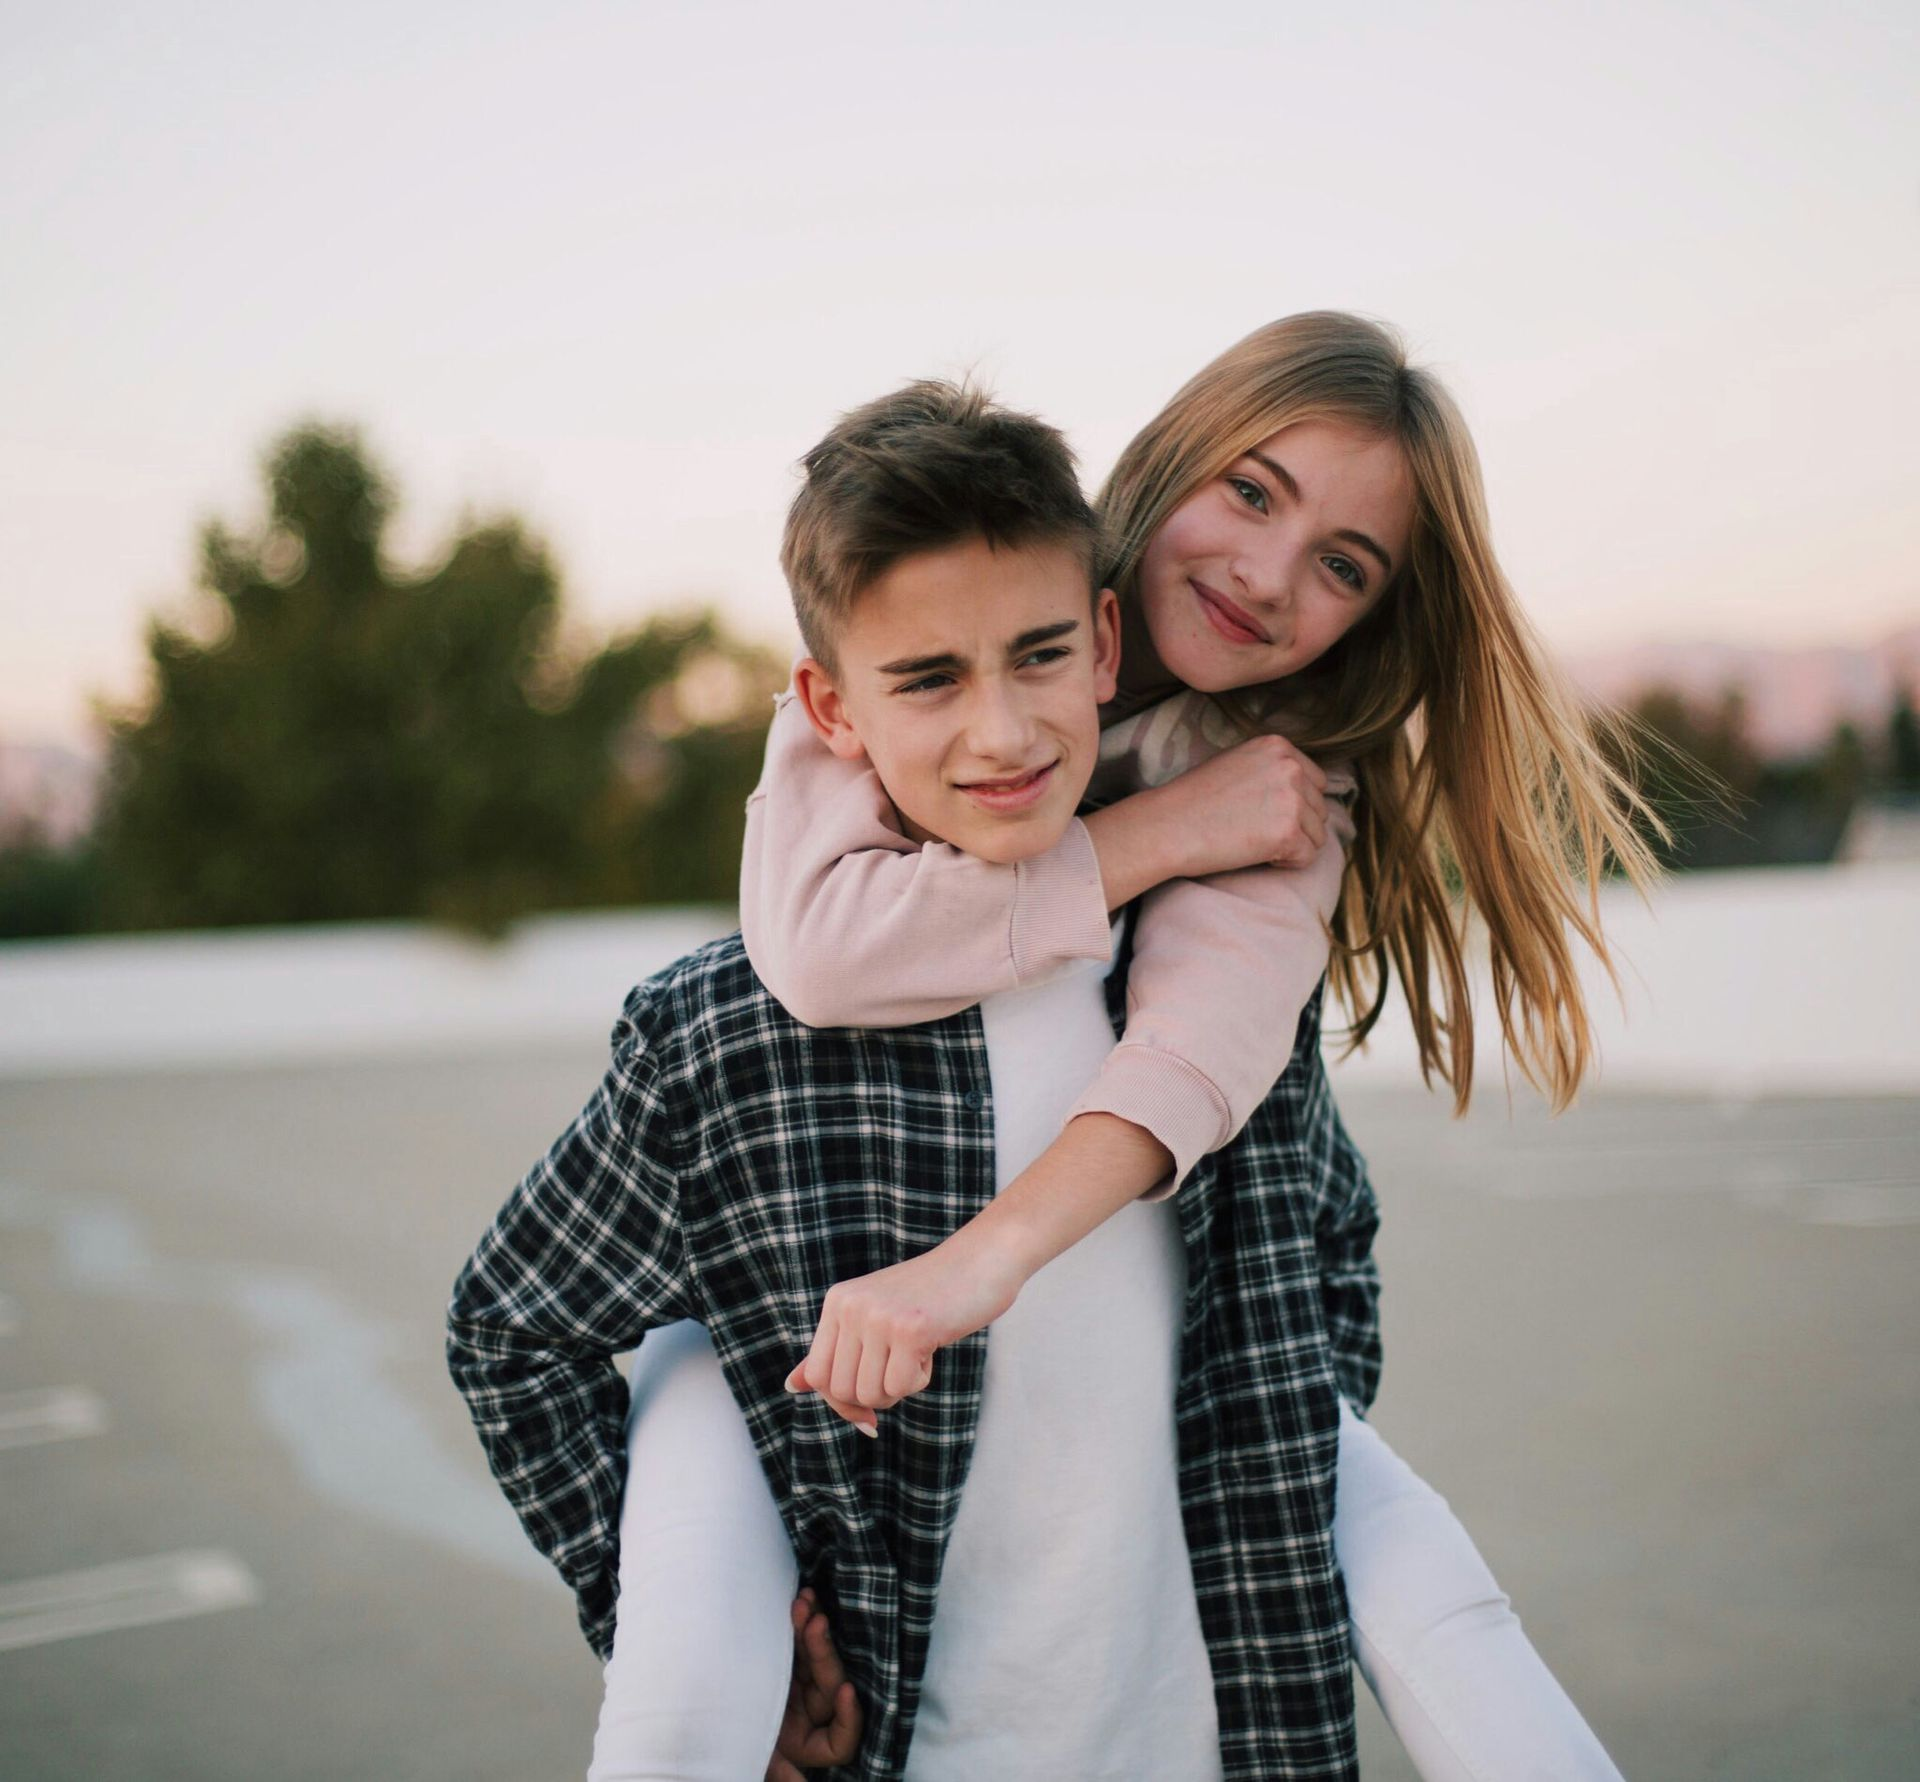 2017 Johnny Orlando His Sister